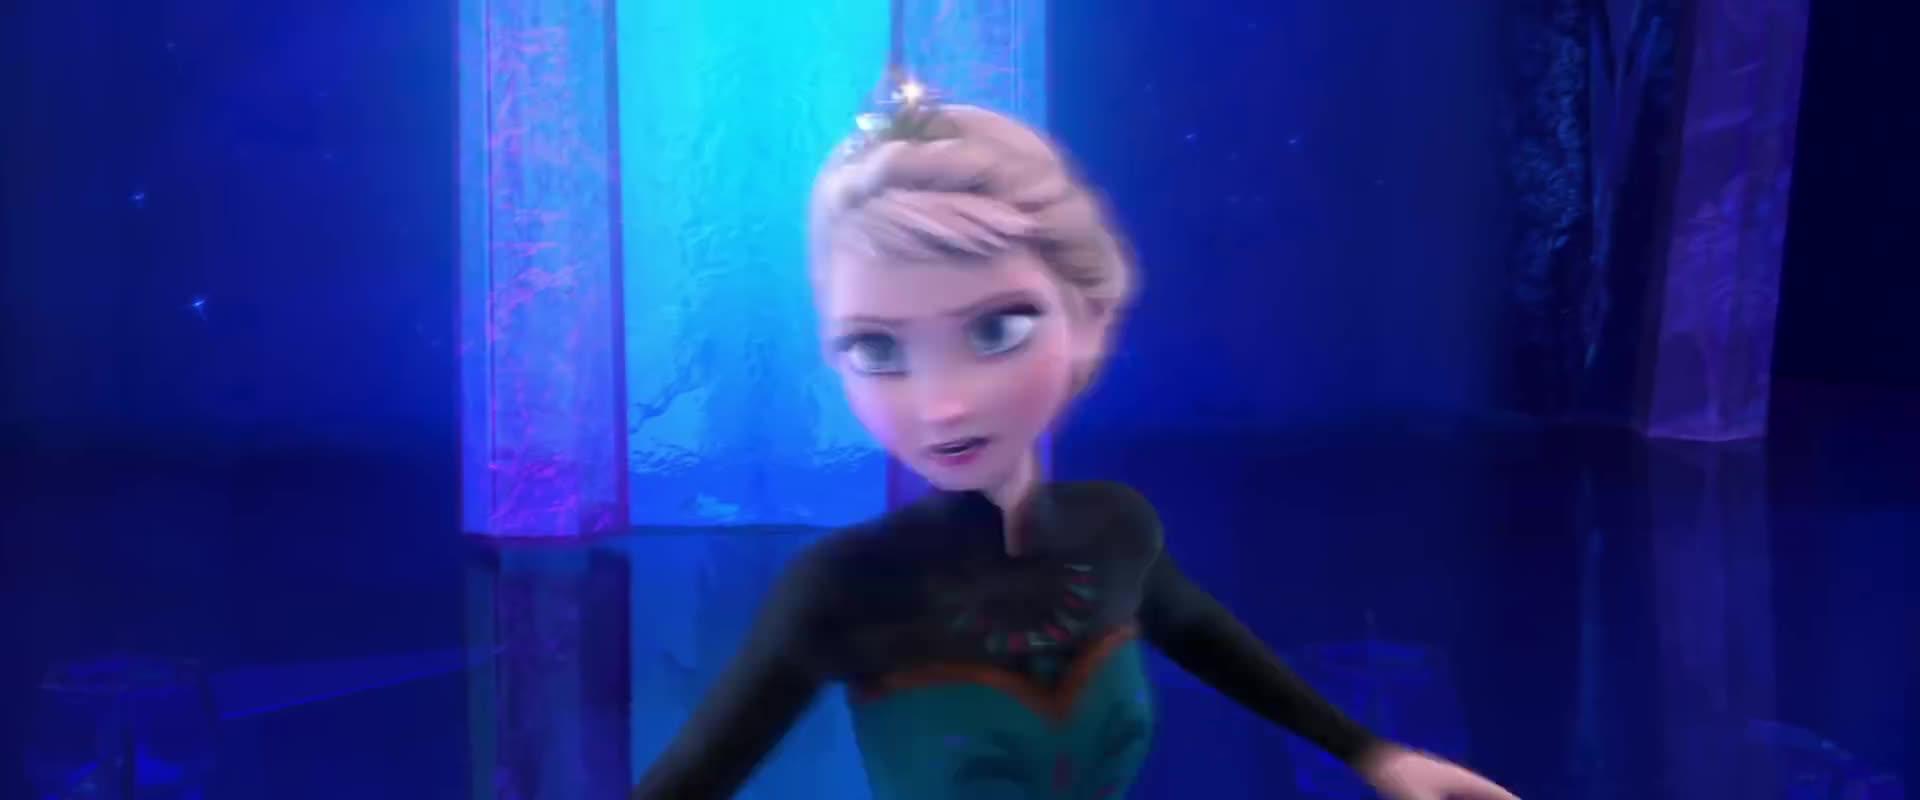 Best Song, Bobby Lopez, Disney, Disney's Frozen, Frozen, Idina Menzel, Kristen Anderson-Lopez, Let It Go, Music, Song, best song, bobby lopez, disney, disney's frozen, frozen, idina menzel, kristen anderson-lopez, let it go, music, song, Frozen Elsa braid GIFs